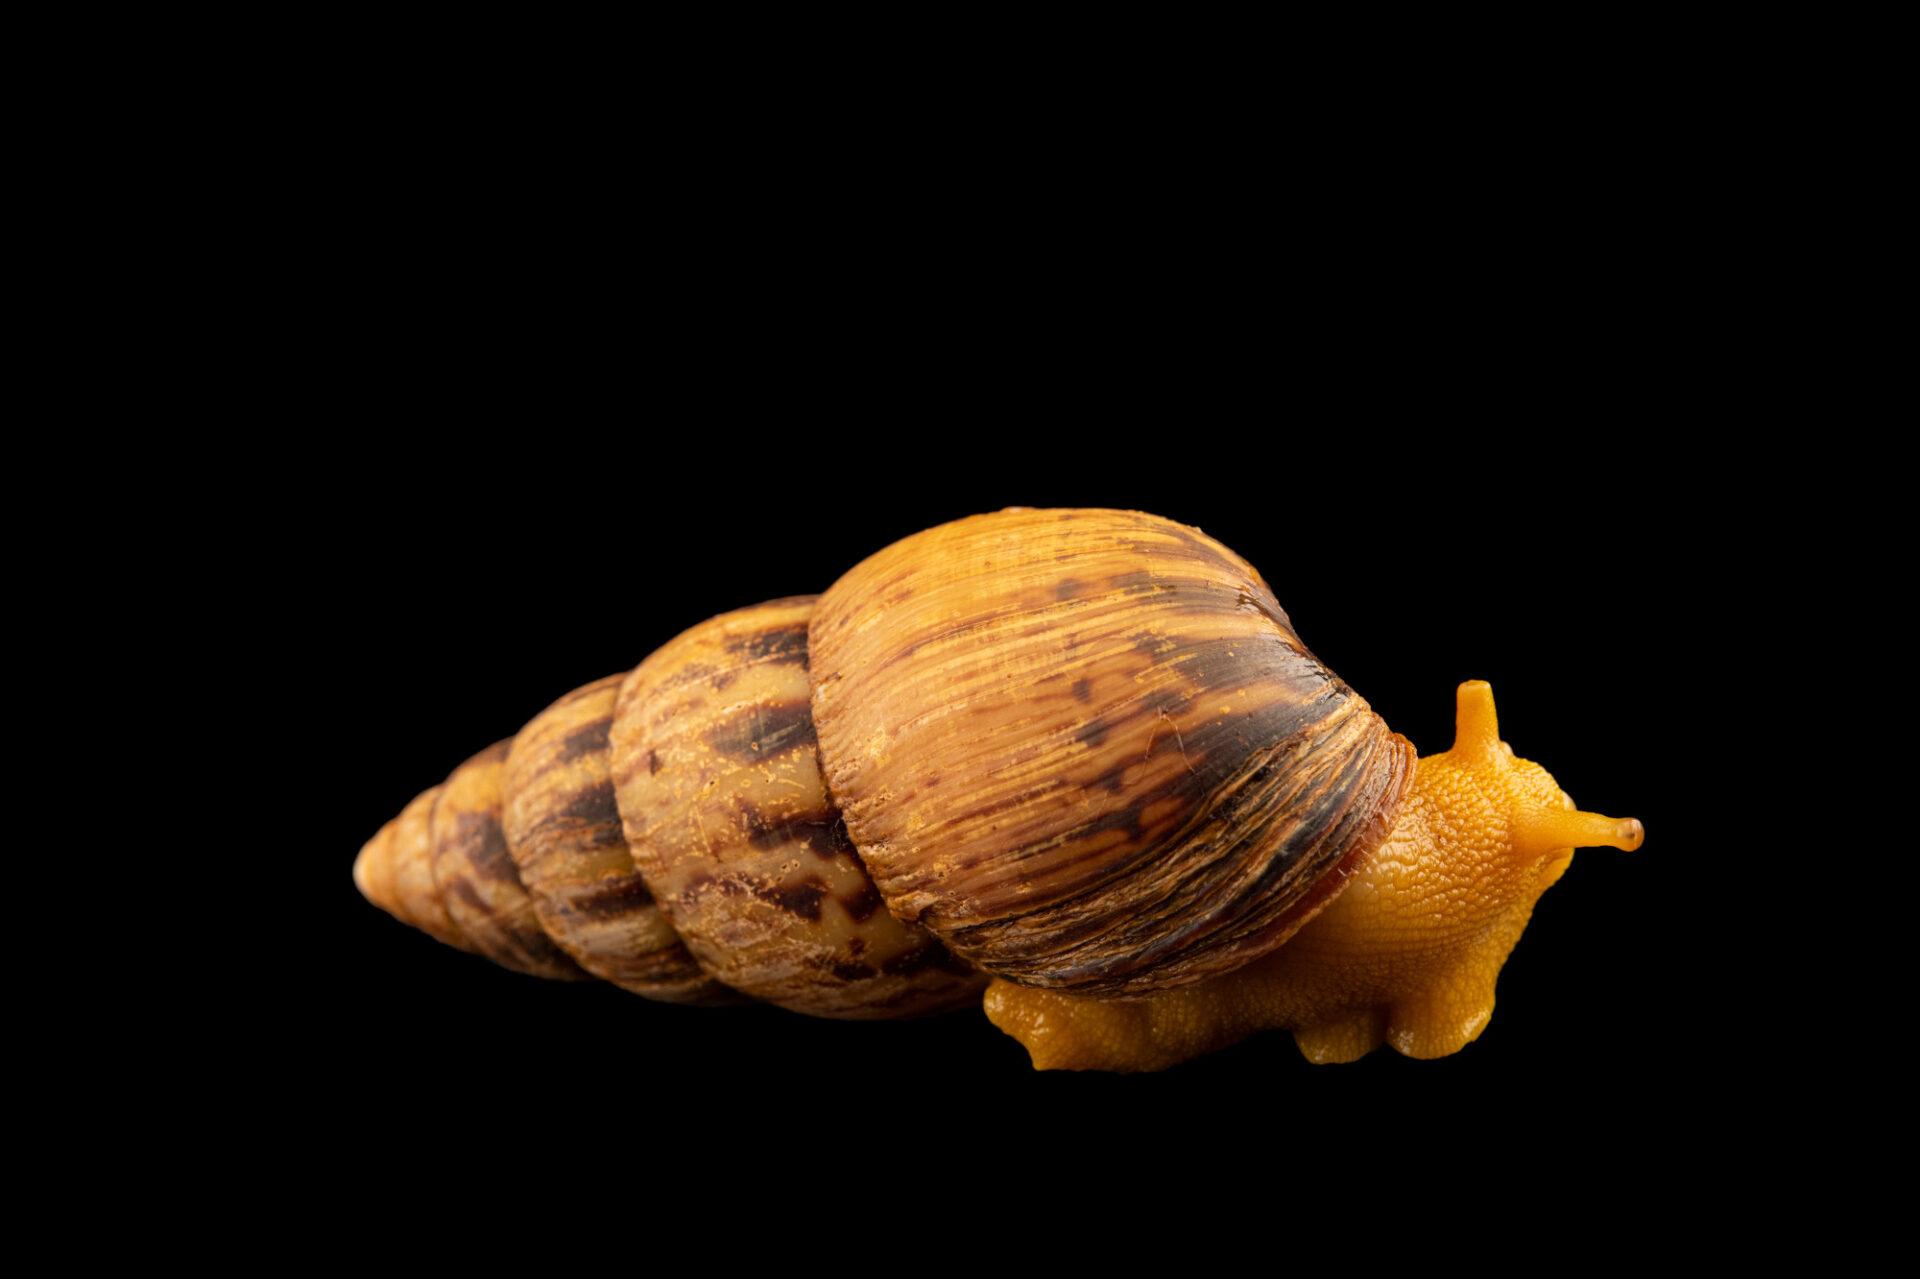 Photo: A Cameroon dark stripe snail (Limicolaria numidica) at Aquarium Berlin.